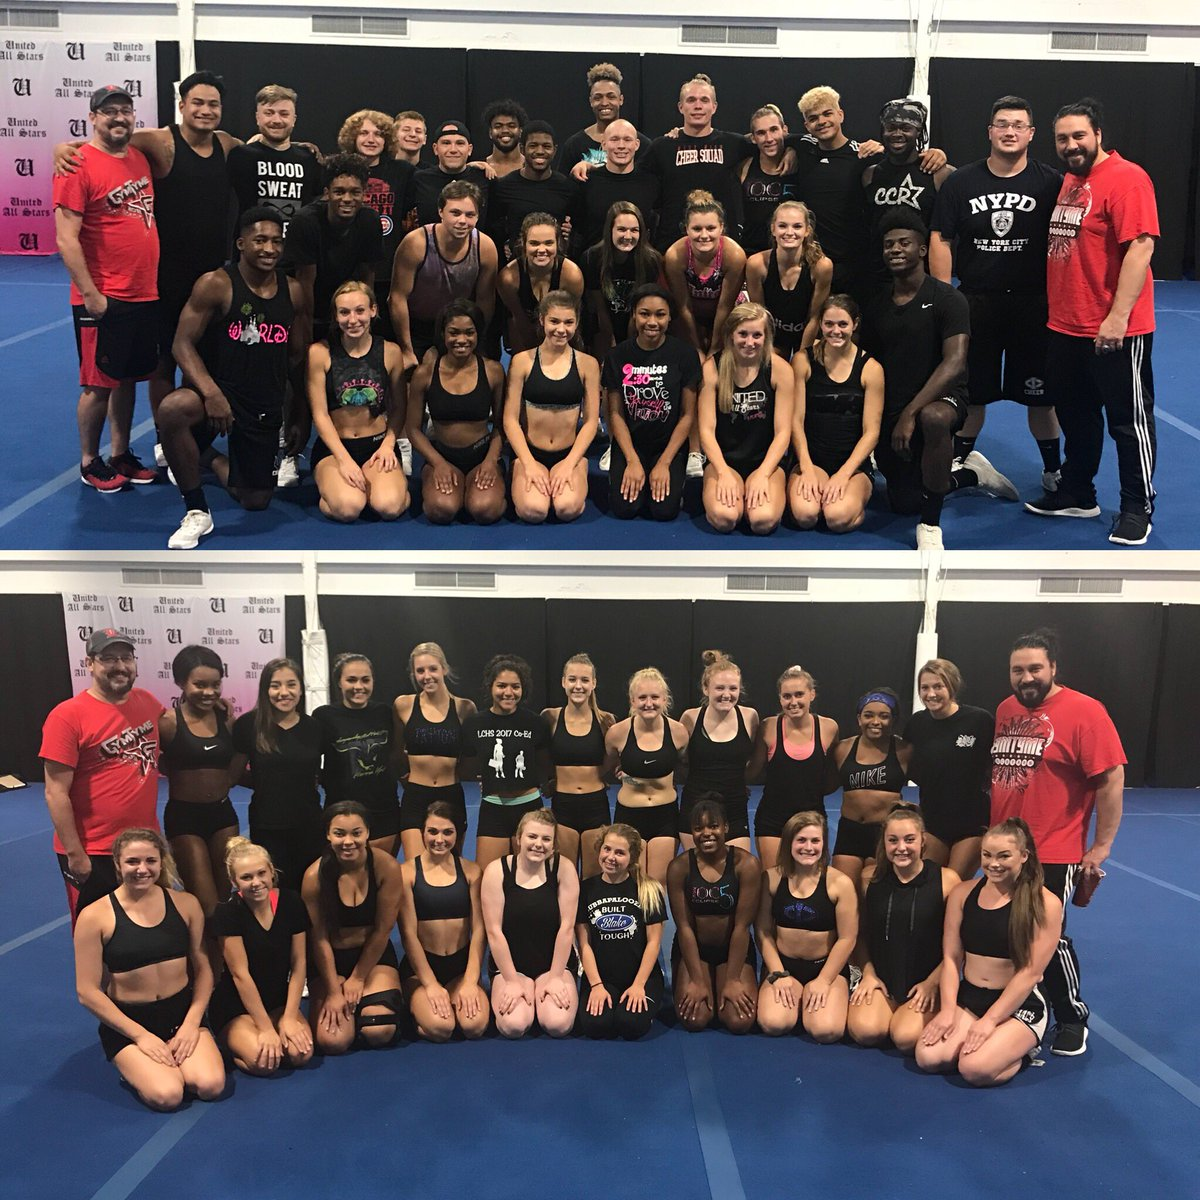 2f58fd27797 Iowa Central CC Cheerleading on Twitter